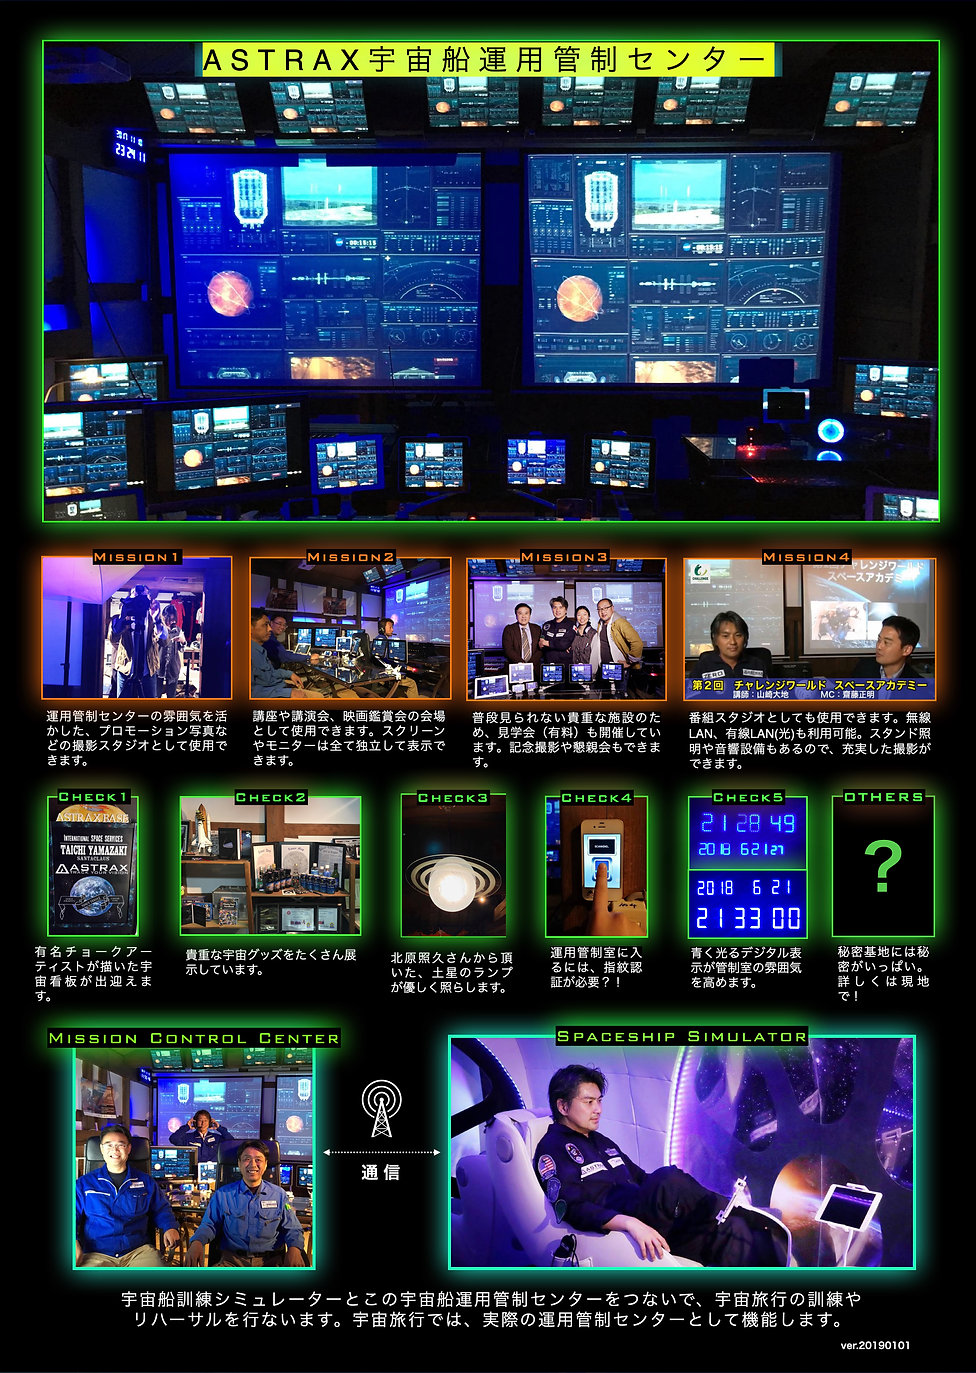 ASTRAX ACADEMYパンフサイト用_20210615.024.jpeg